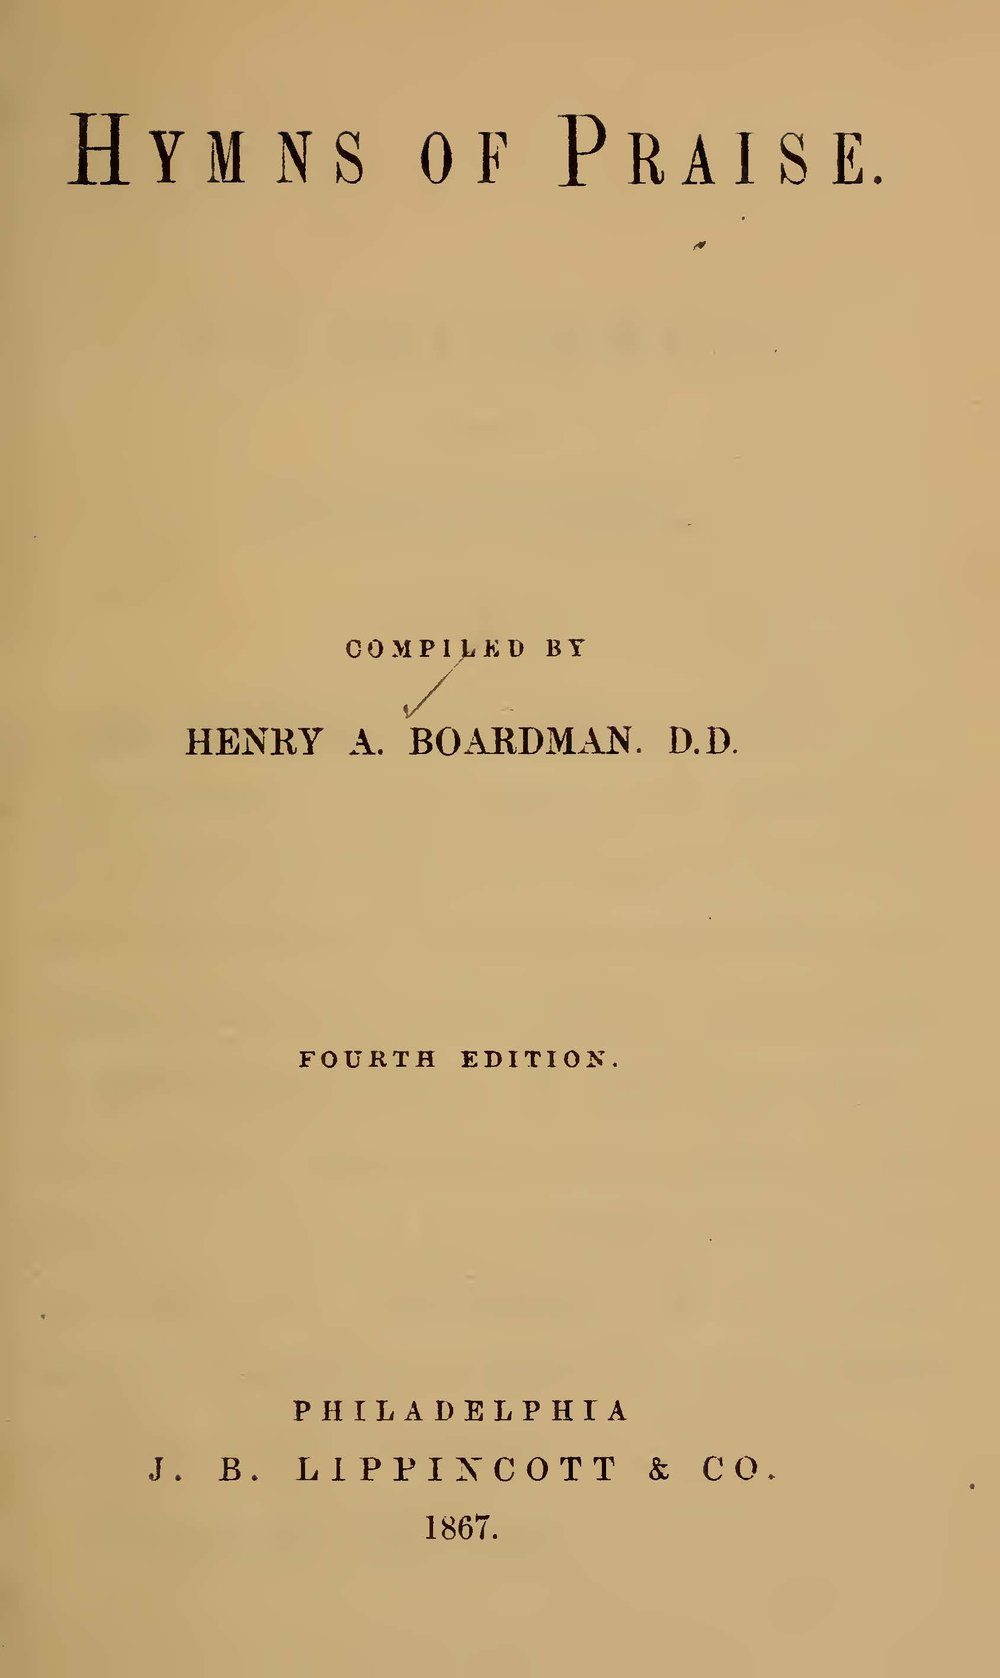 Boardman, Henry Augustus, Hymns of Praise Title Page.jpg